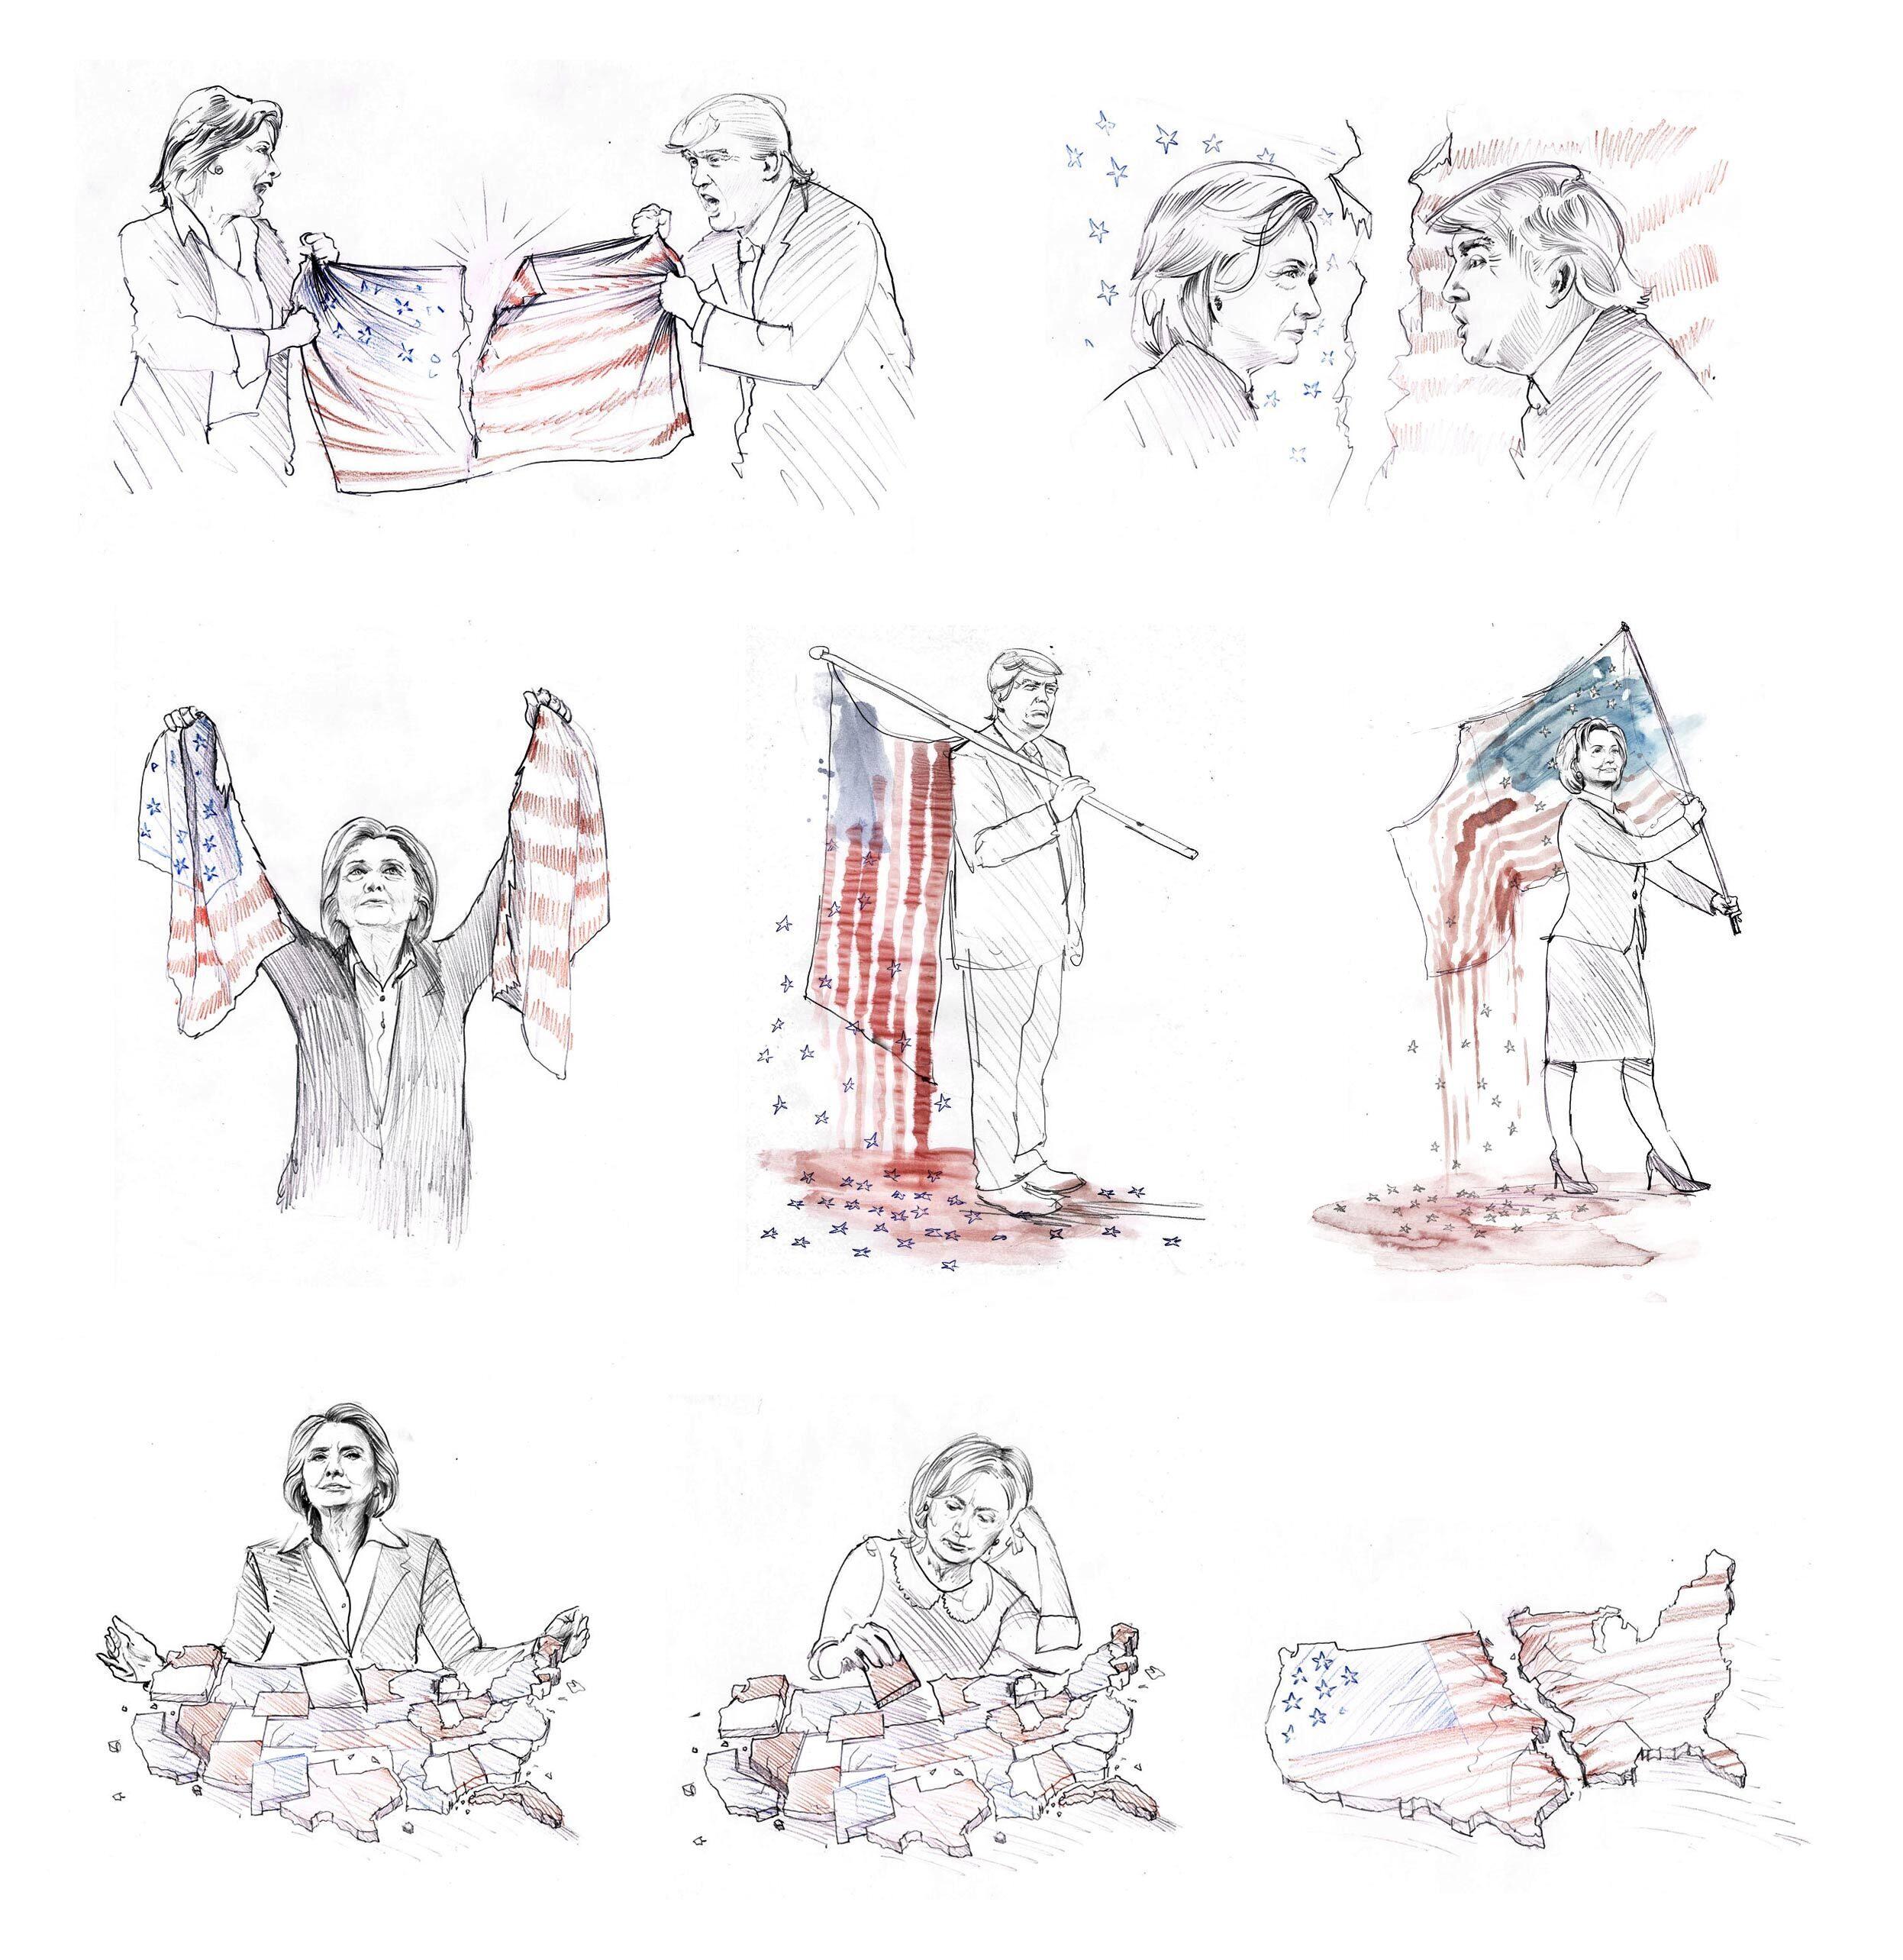 Elections sketches drawing drafts editorial illustration donald trump hilary clinton usa - Kornel Illustration   Kornel Stadler portfolio